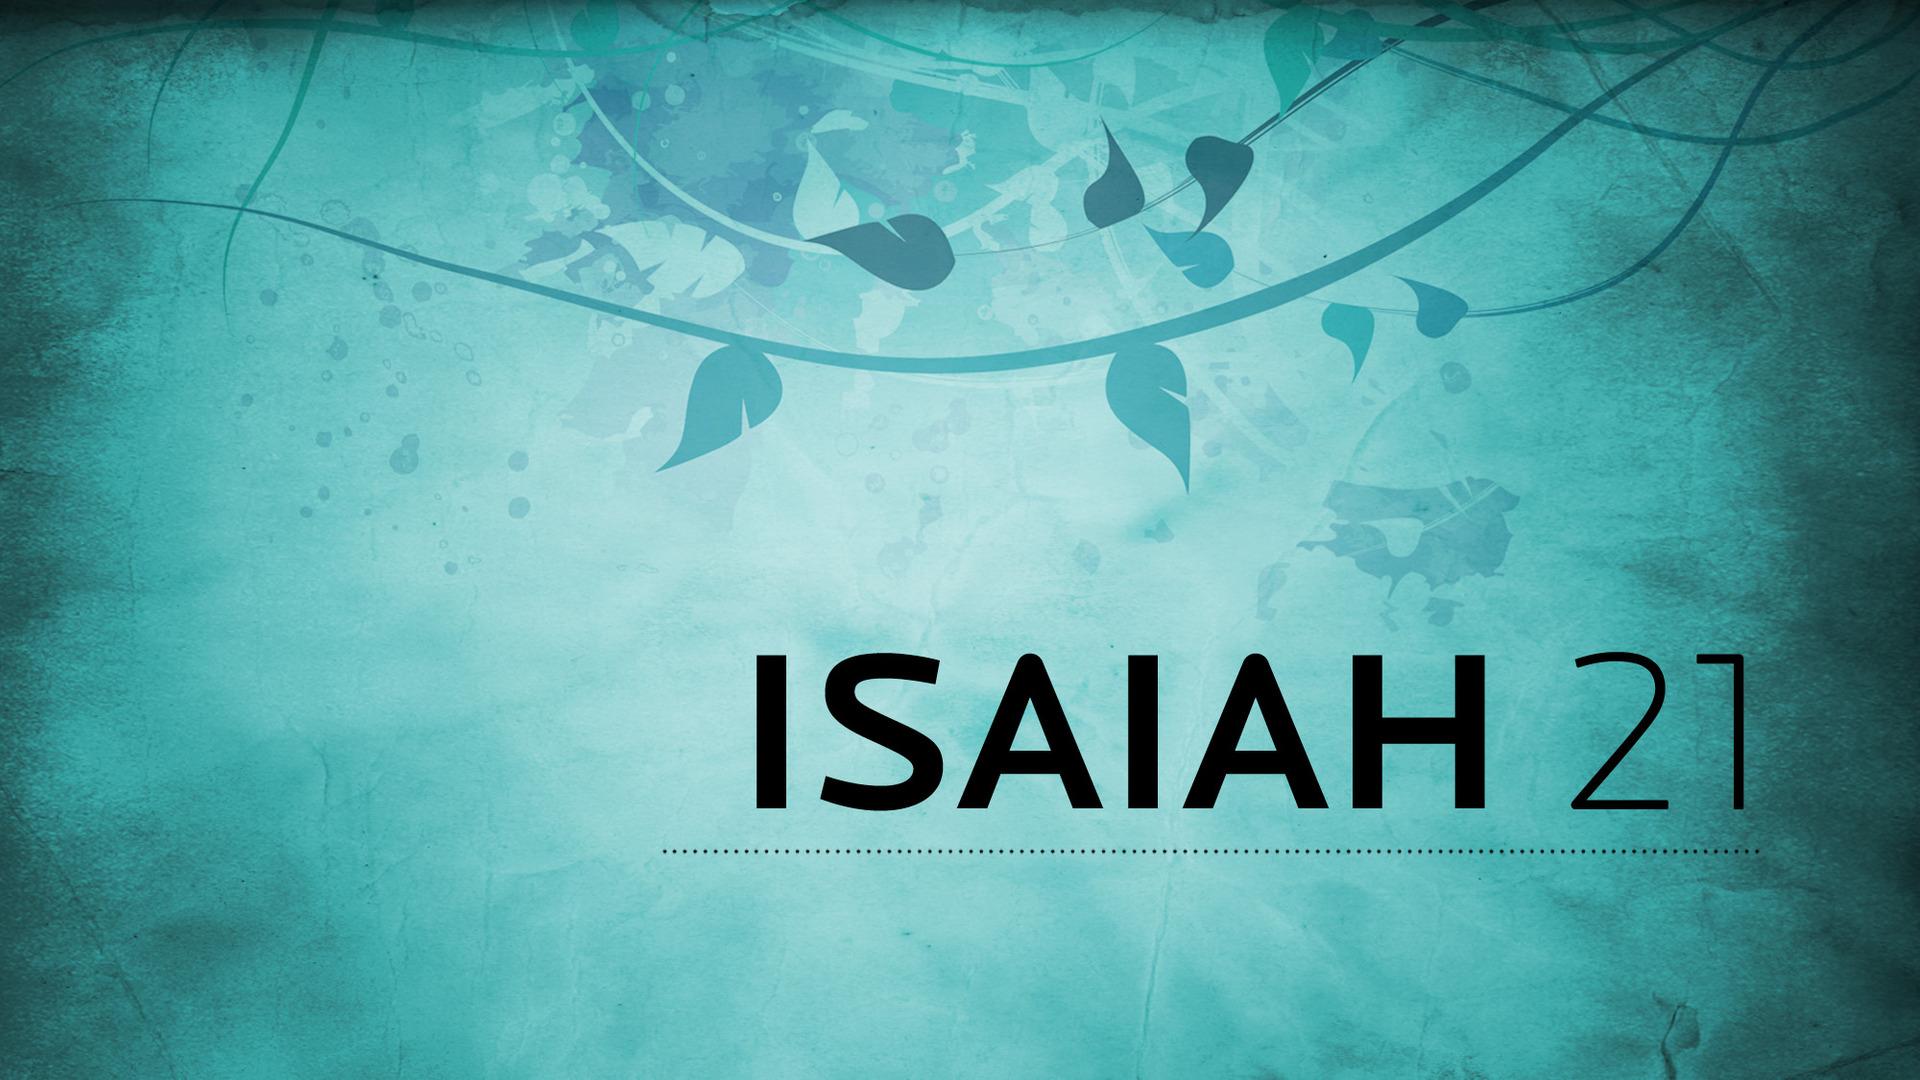 Isaiah 21